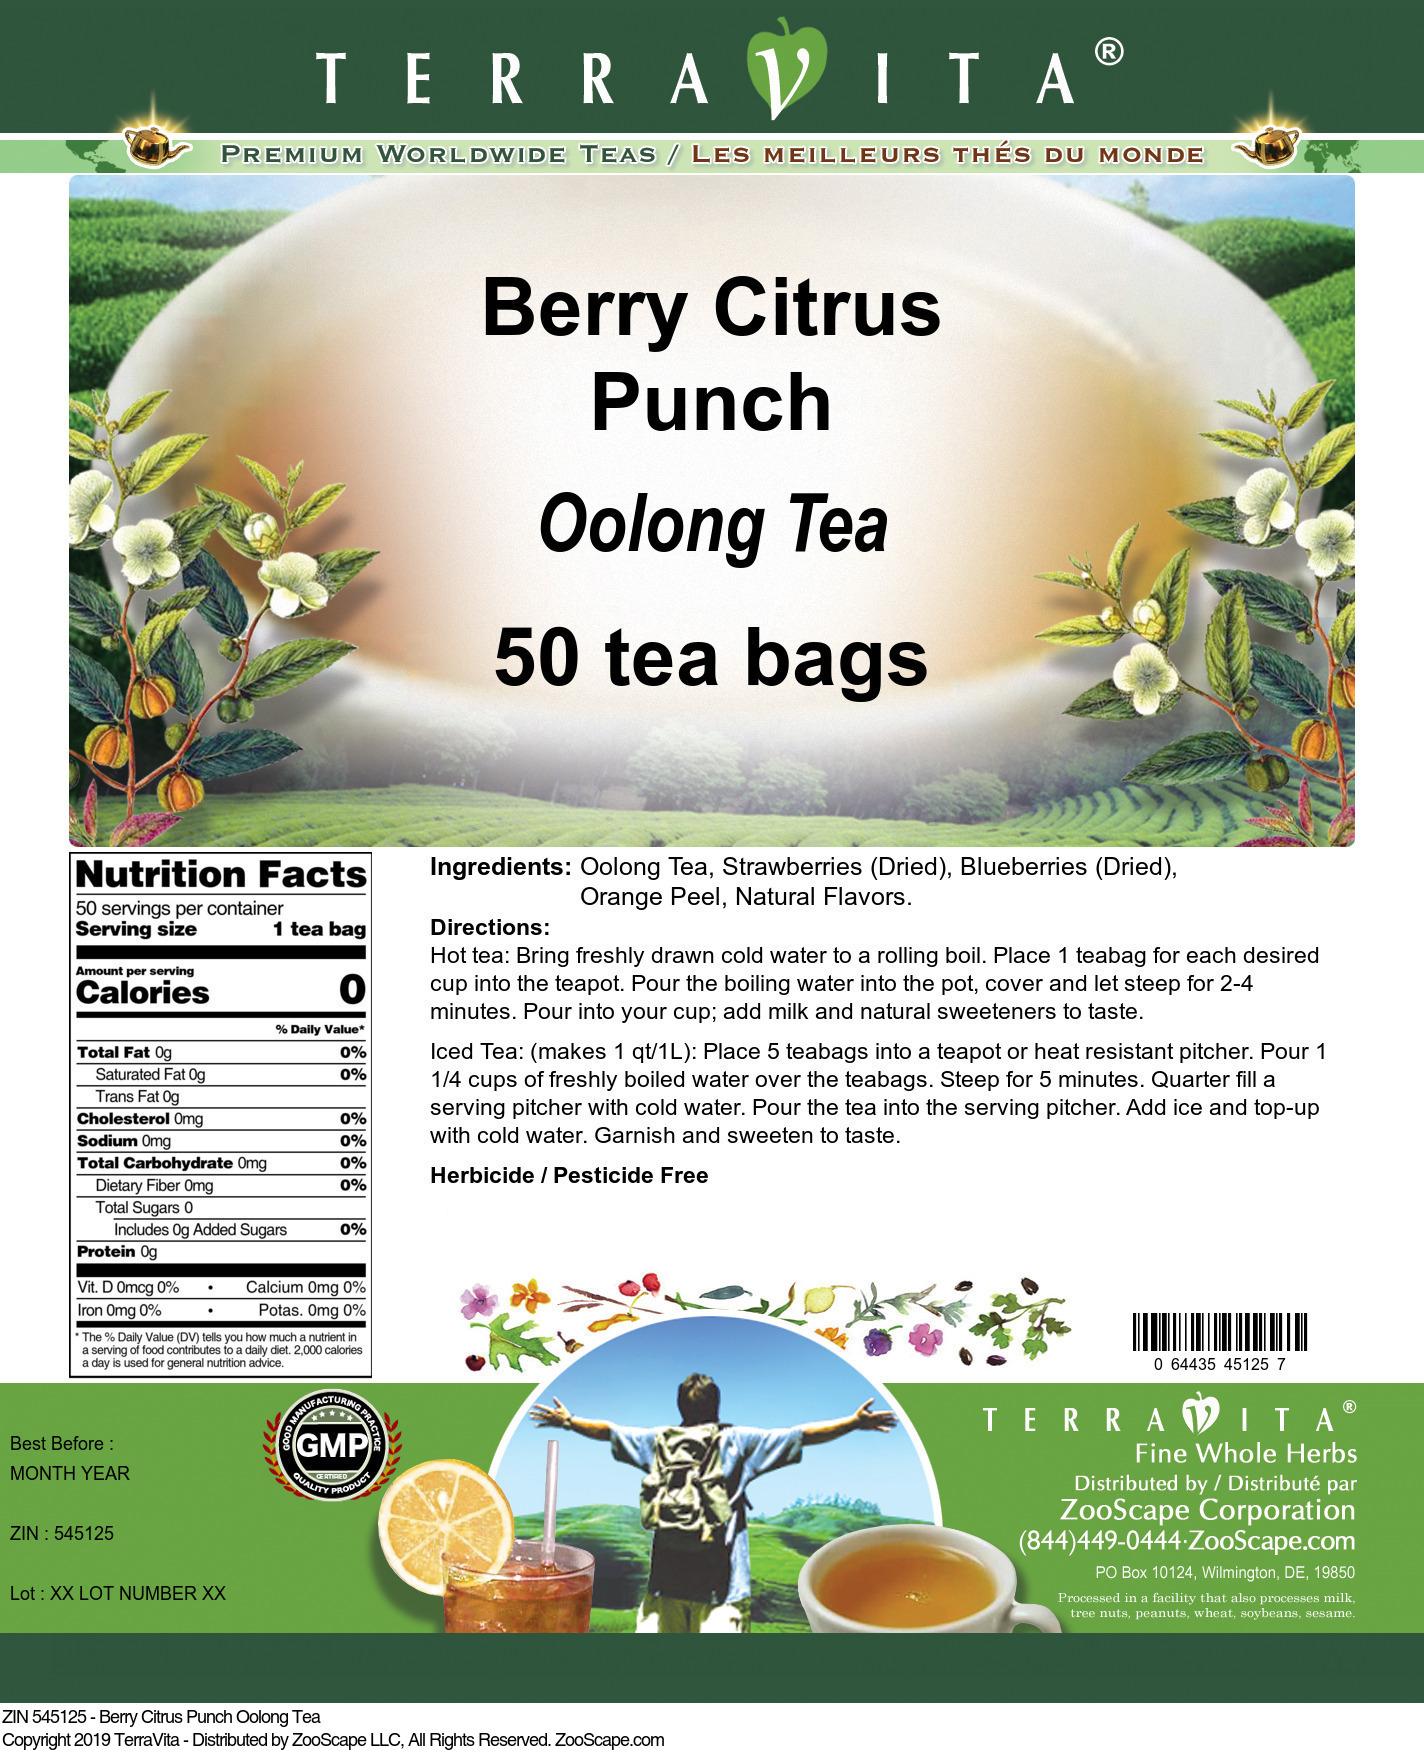 Berry Citrus Punch Oolong Tea